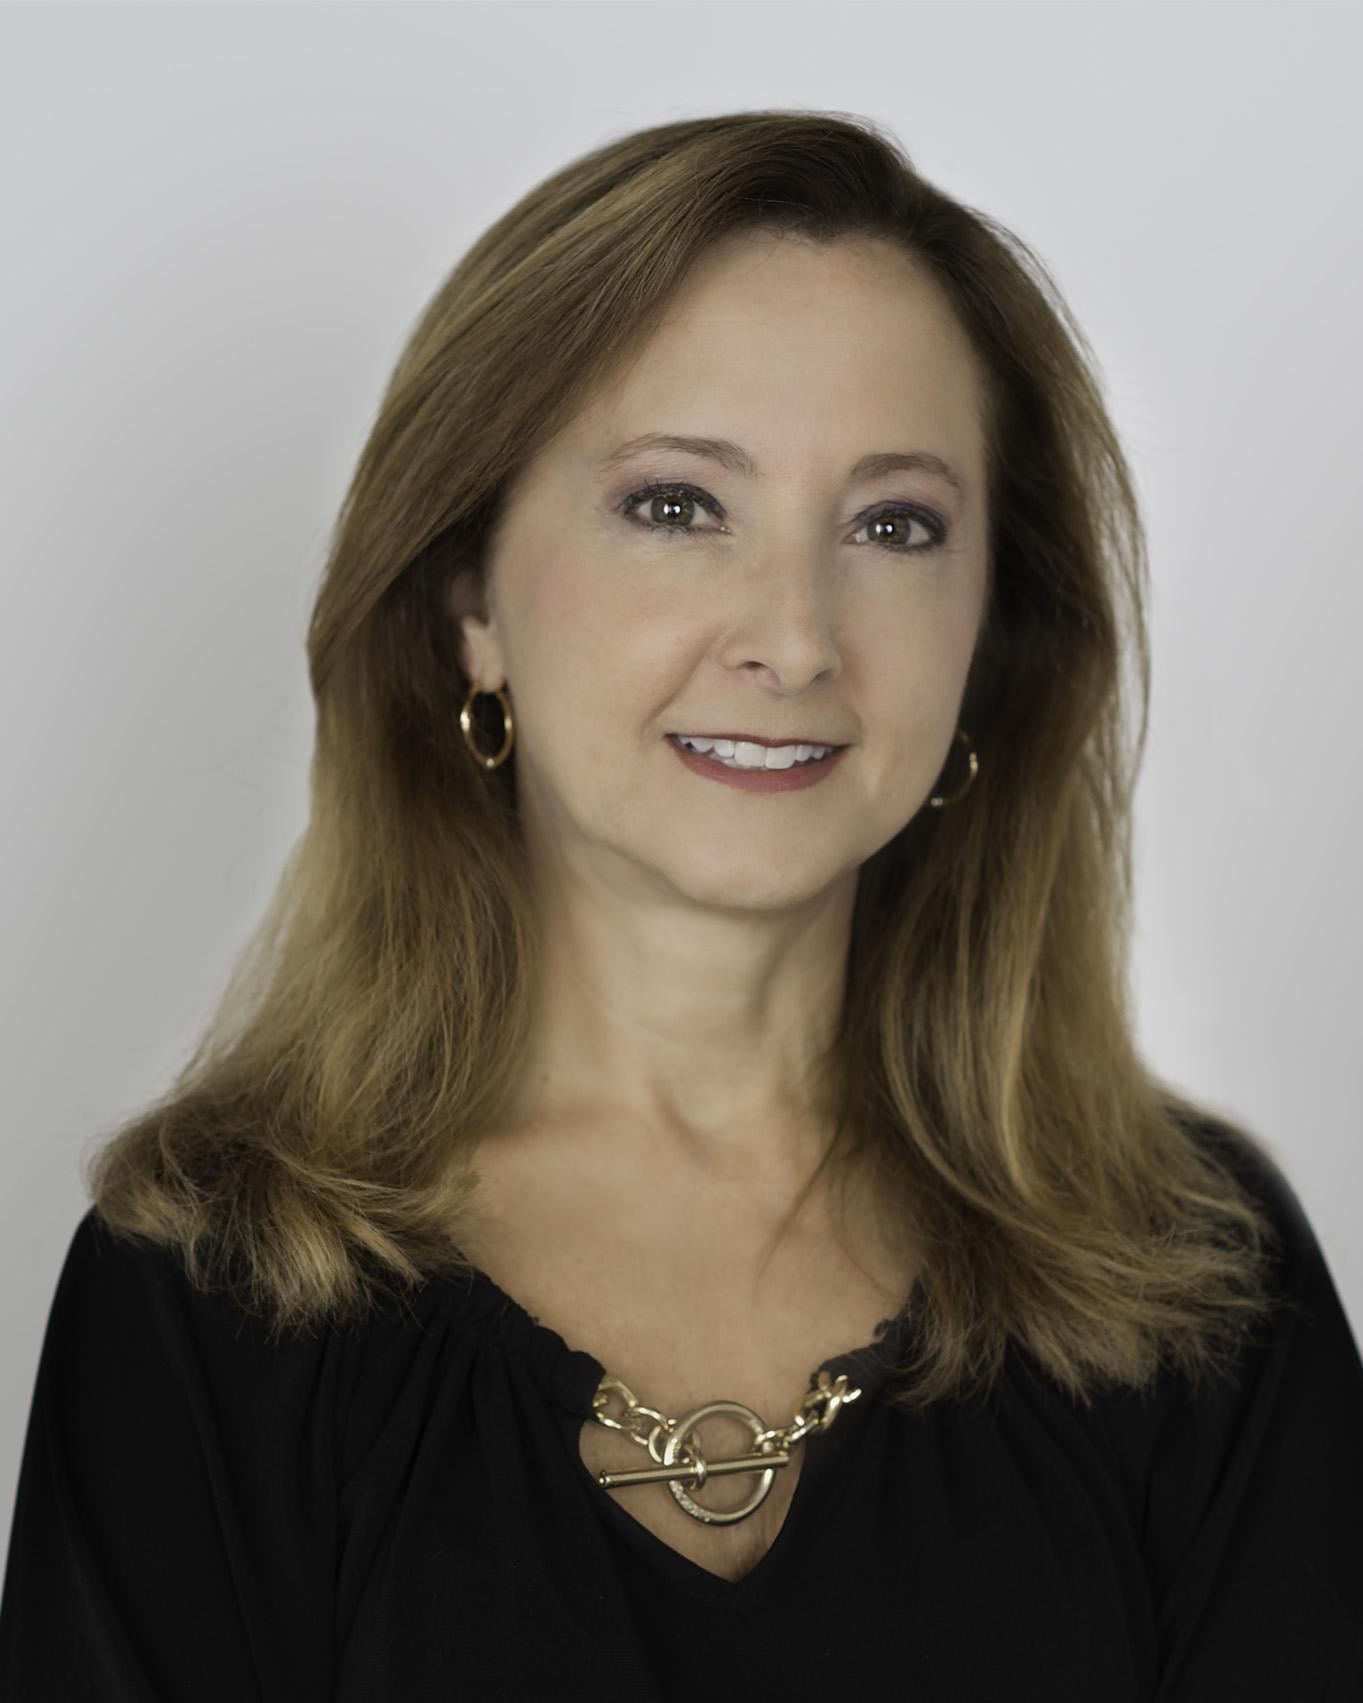 Lynn Patacca